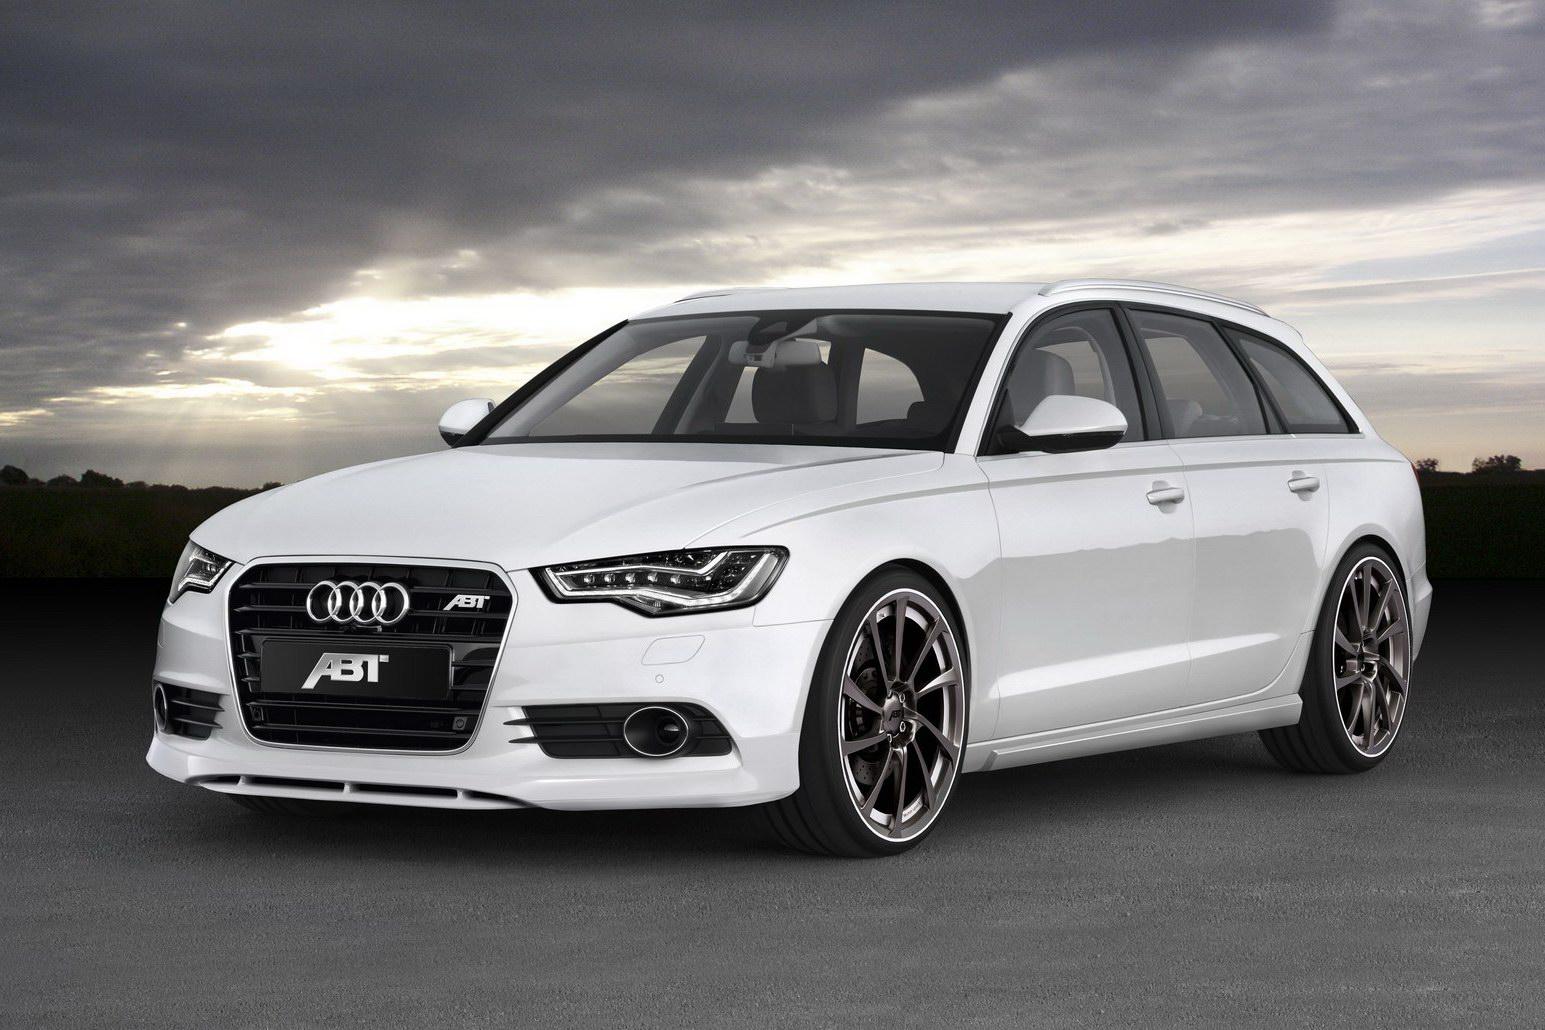 2011 Abt Audi A6 Avant Wallpapers Auto Cars Concept